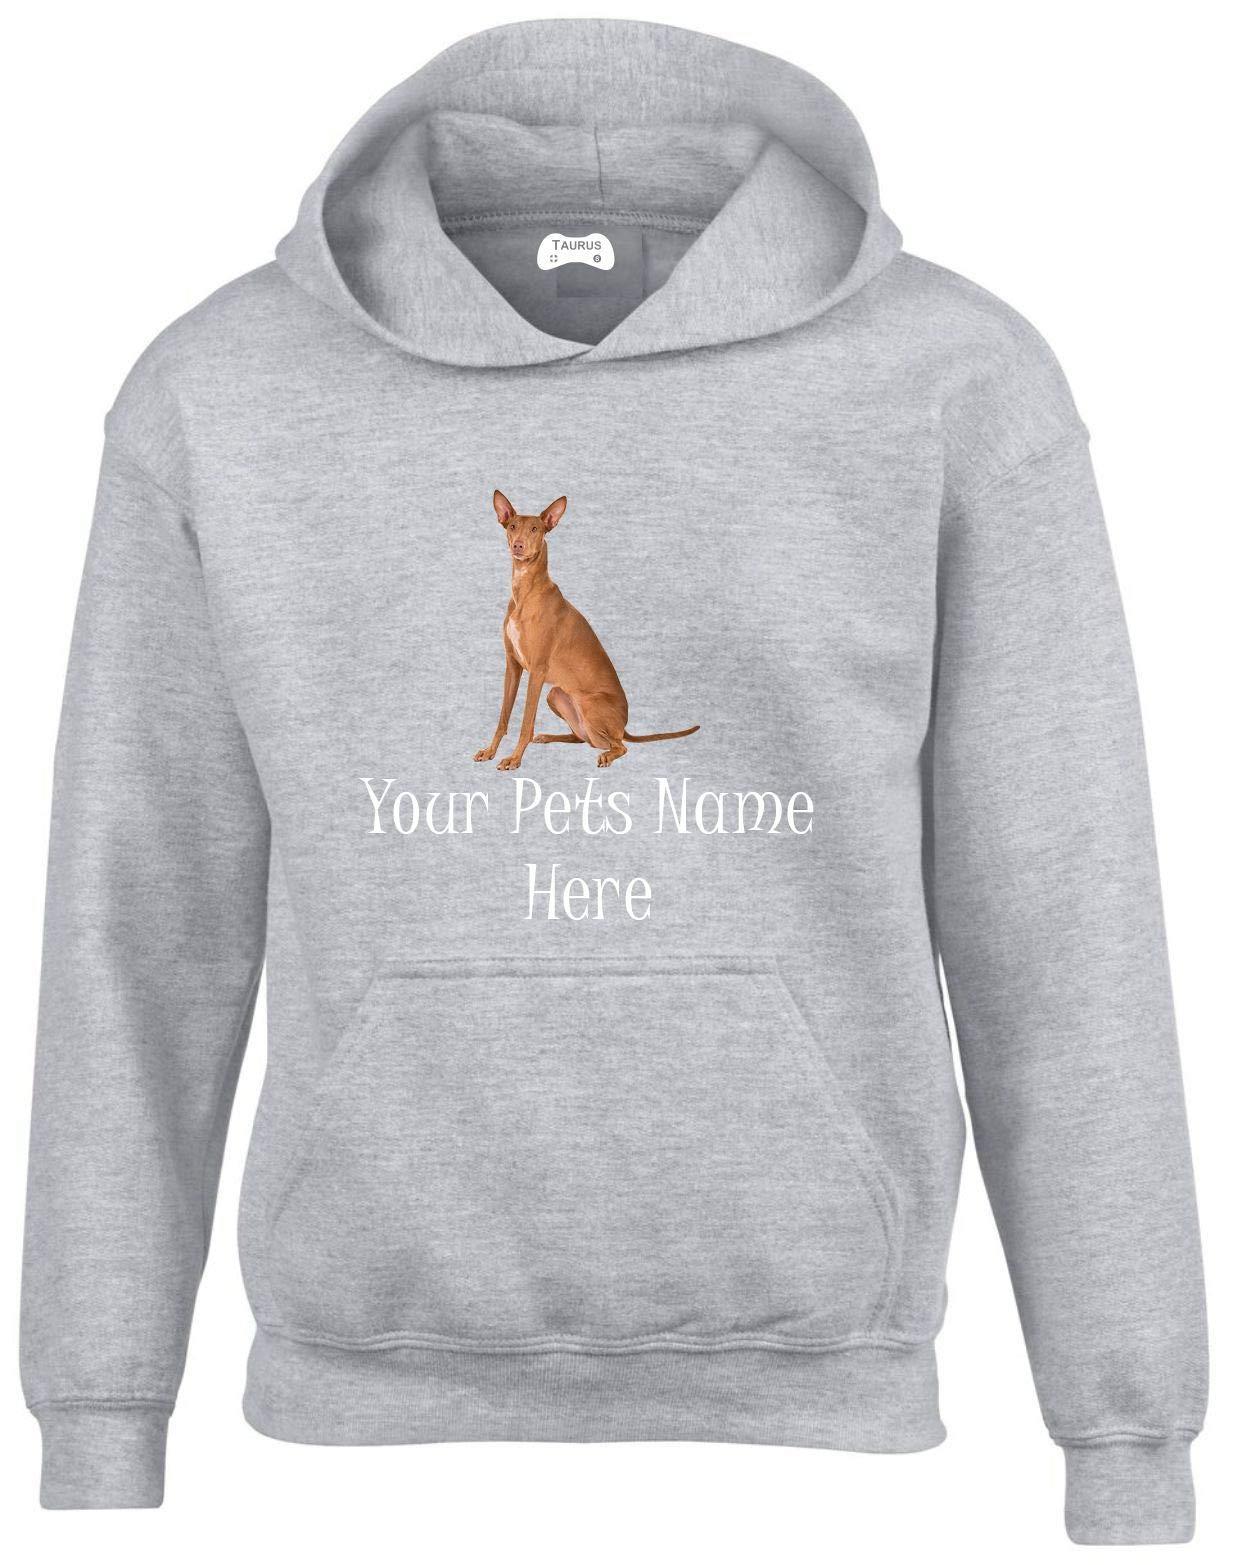 Taurus Clothing Dandie Dinmont Terrier Dog Personalised Embroidered Beanie Black